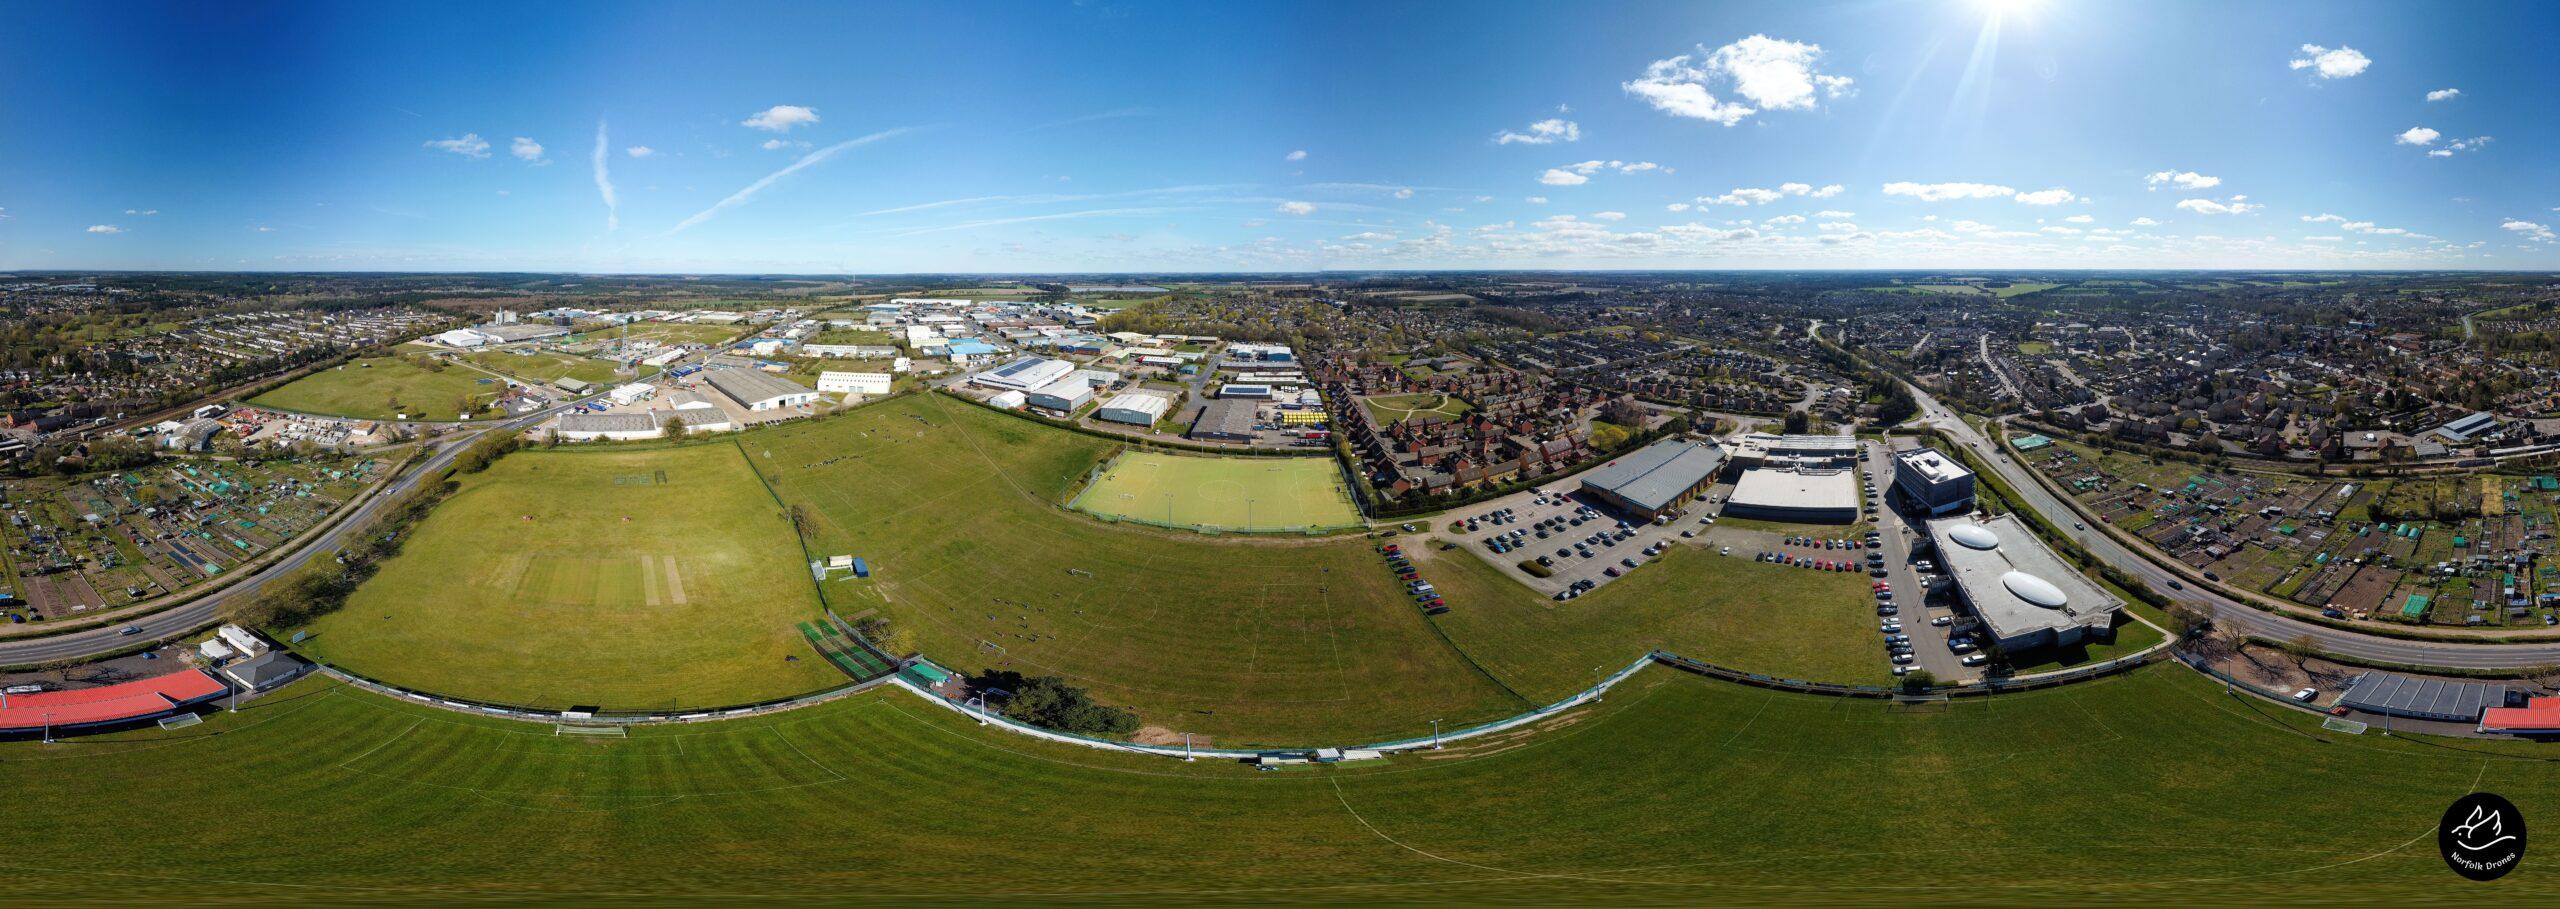 Thetford town-Sports-Centre-Football Club Norfolk Drone